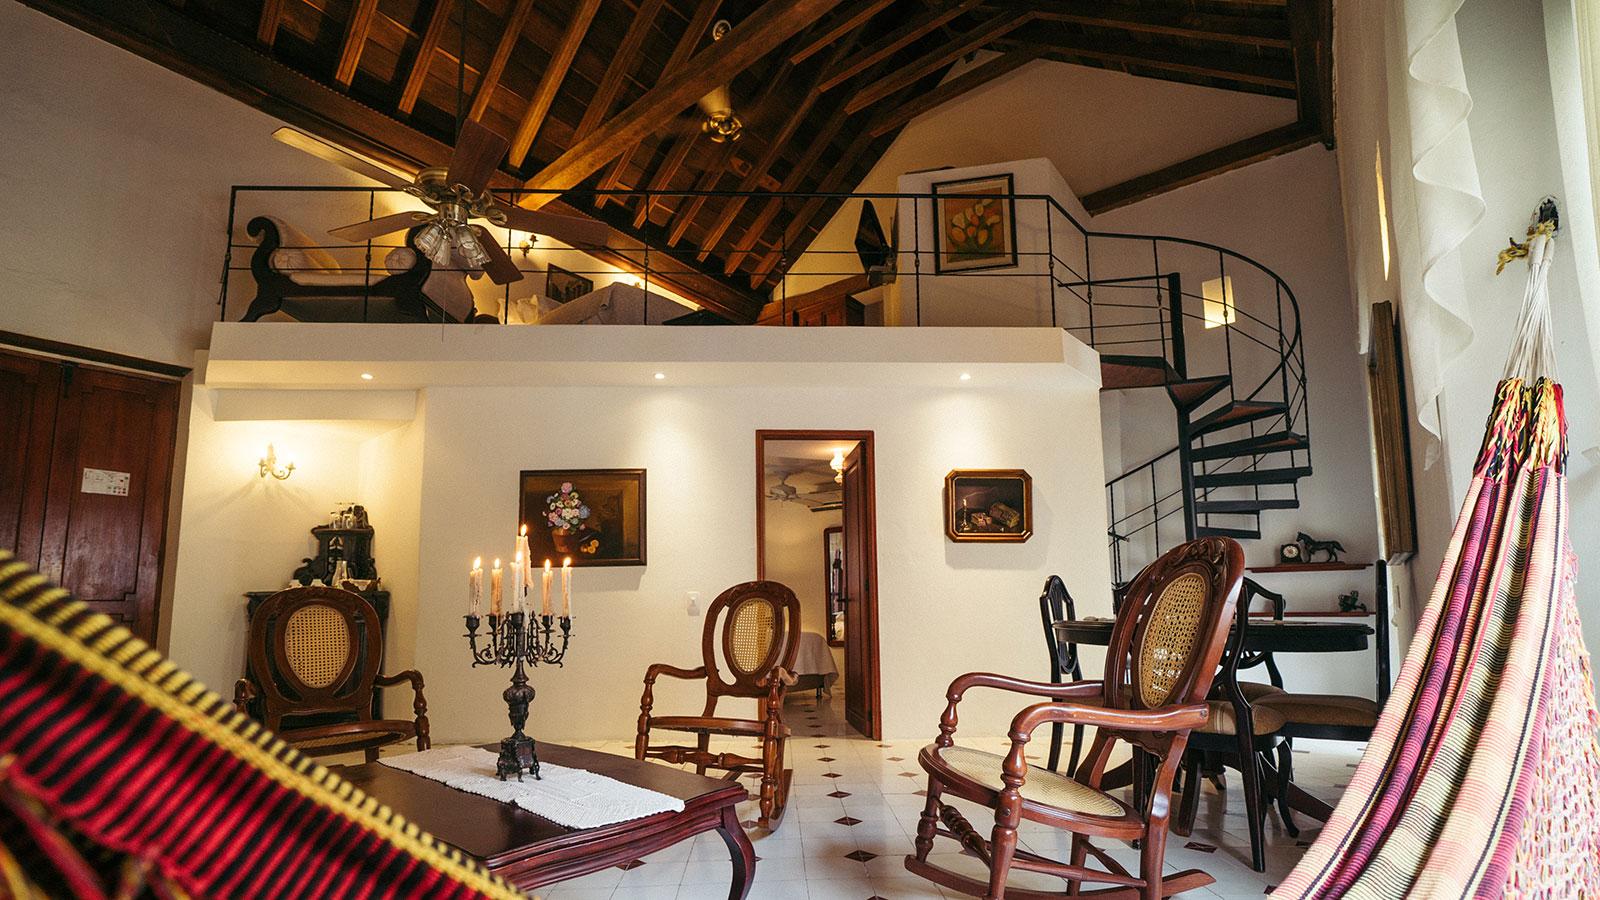 Image of hotel exterior Alfiz Hotel, 1700, Member of Historic Hotels Worldwide, in Cartagena de Indias, Colombia, Hot Deals